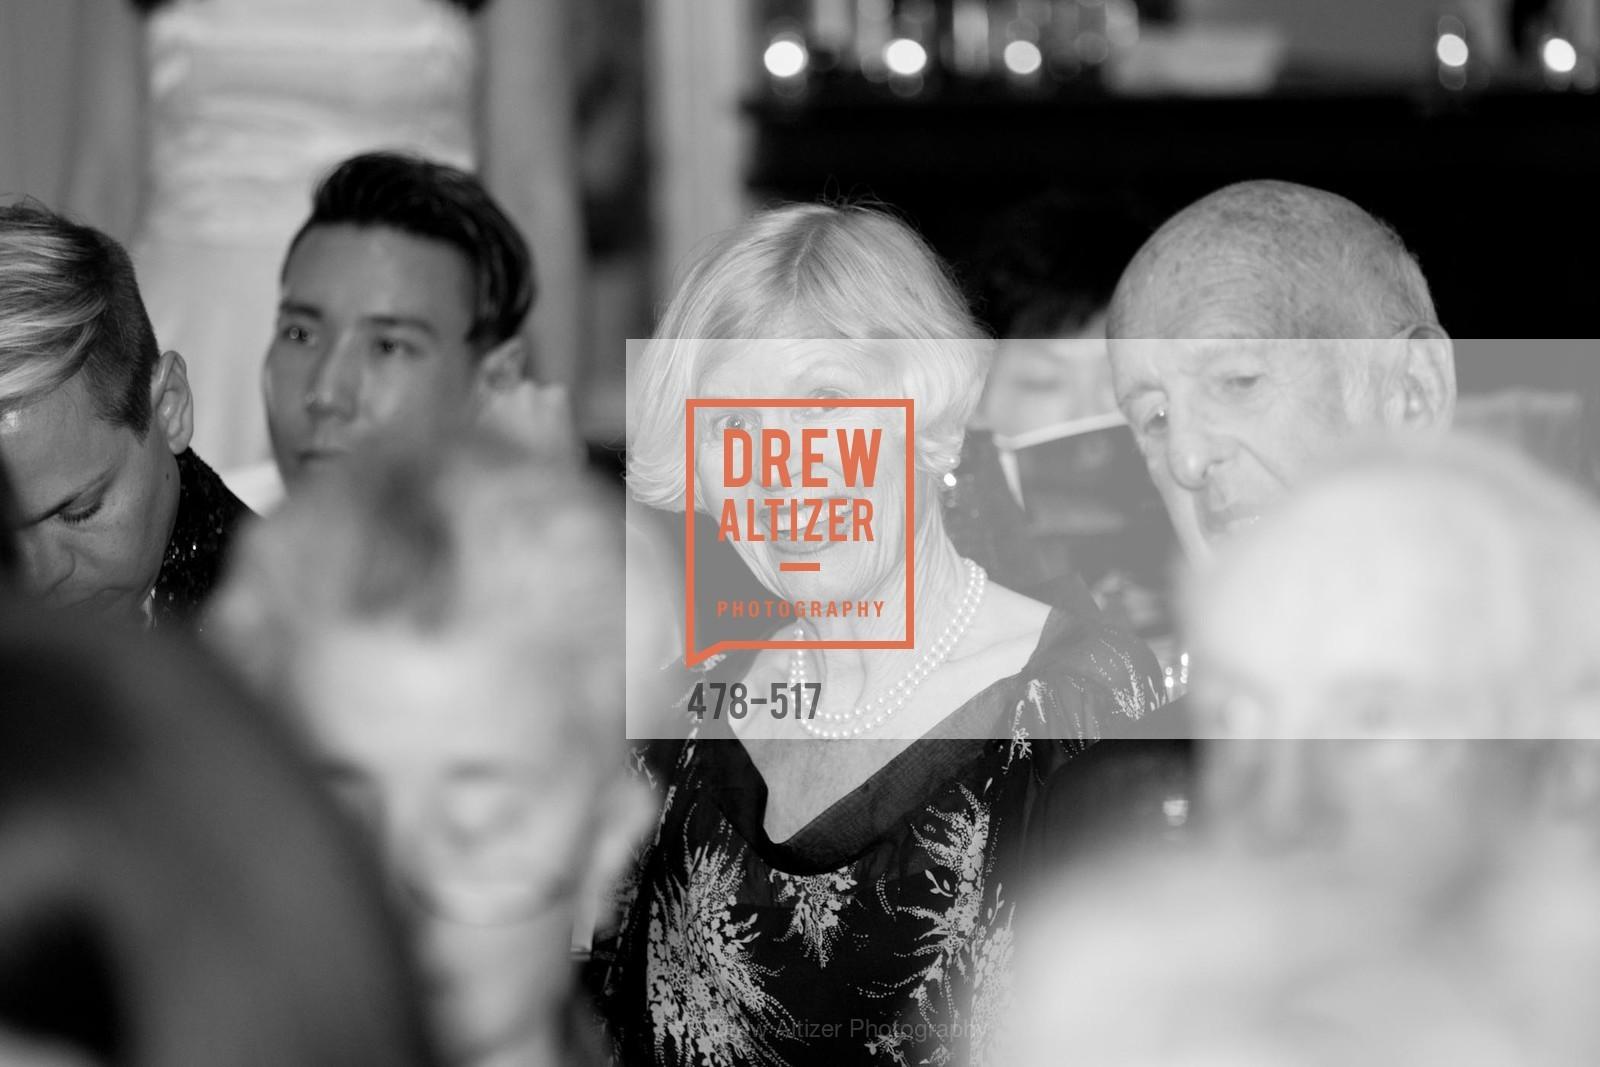 Extras, SAN FRANCISCO OPERA GUILD Presents POPera, April 10th, 2014, Photo,Drew Altizer, Drew Altizer Photography, full-service agency, private events, San Francisco photographer, photographer california